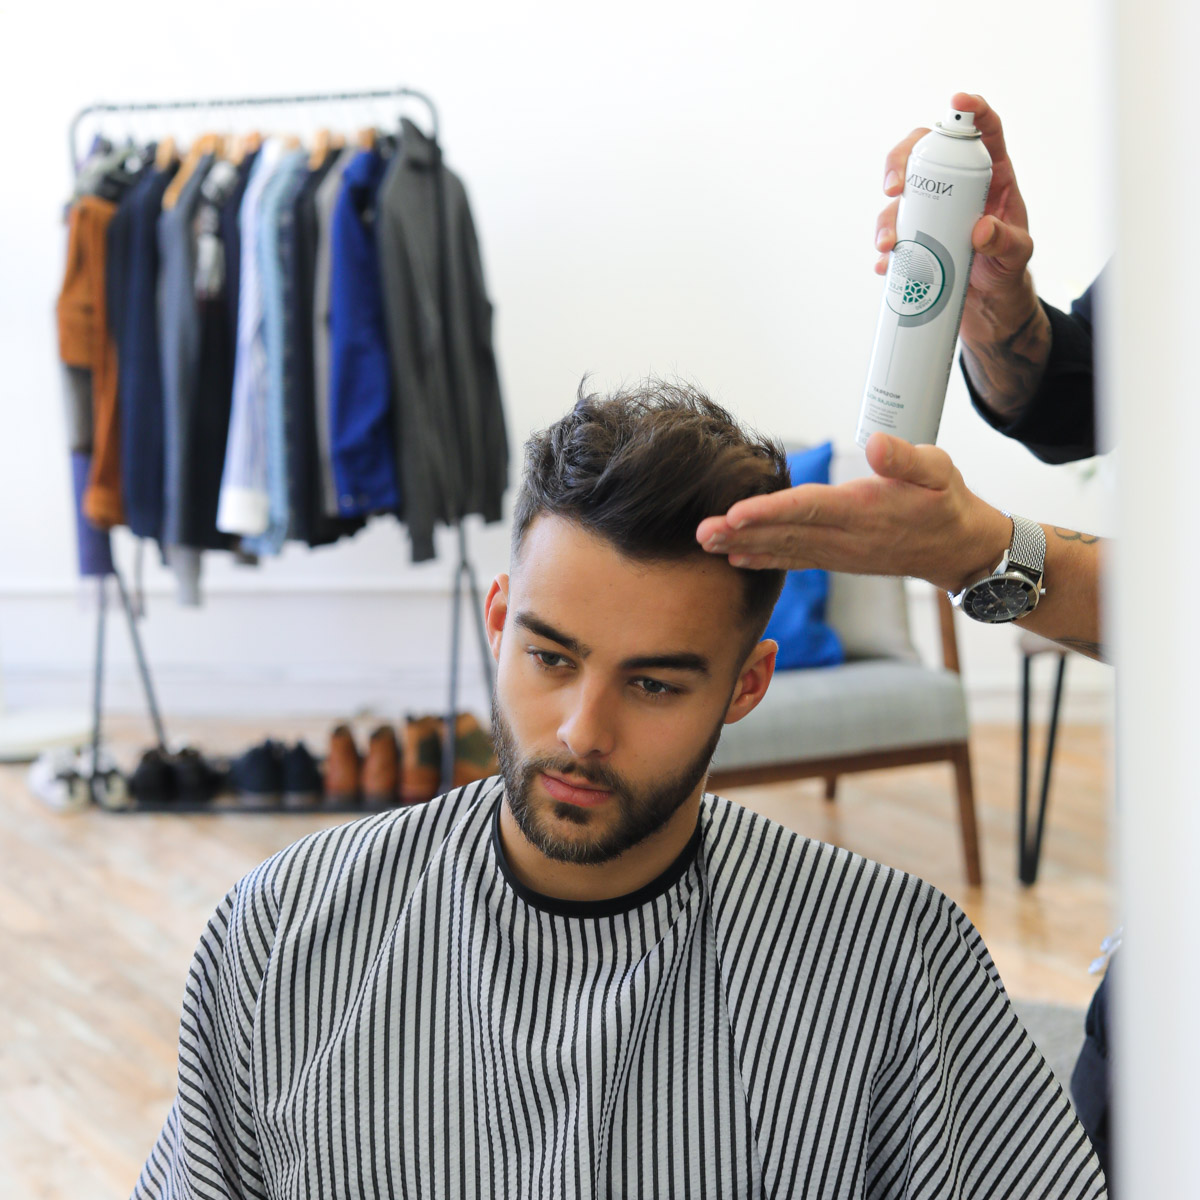 nioxin-hairspray-haircut-style-grooming-matt-man-for-himself